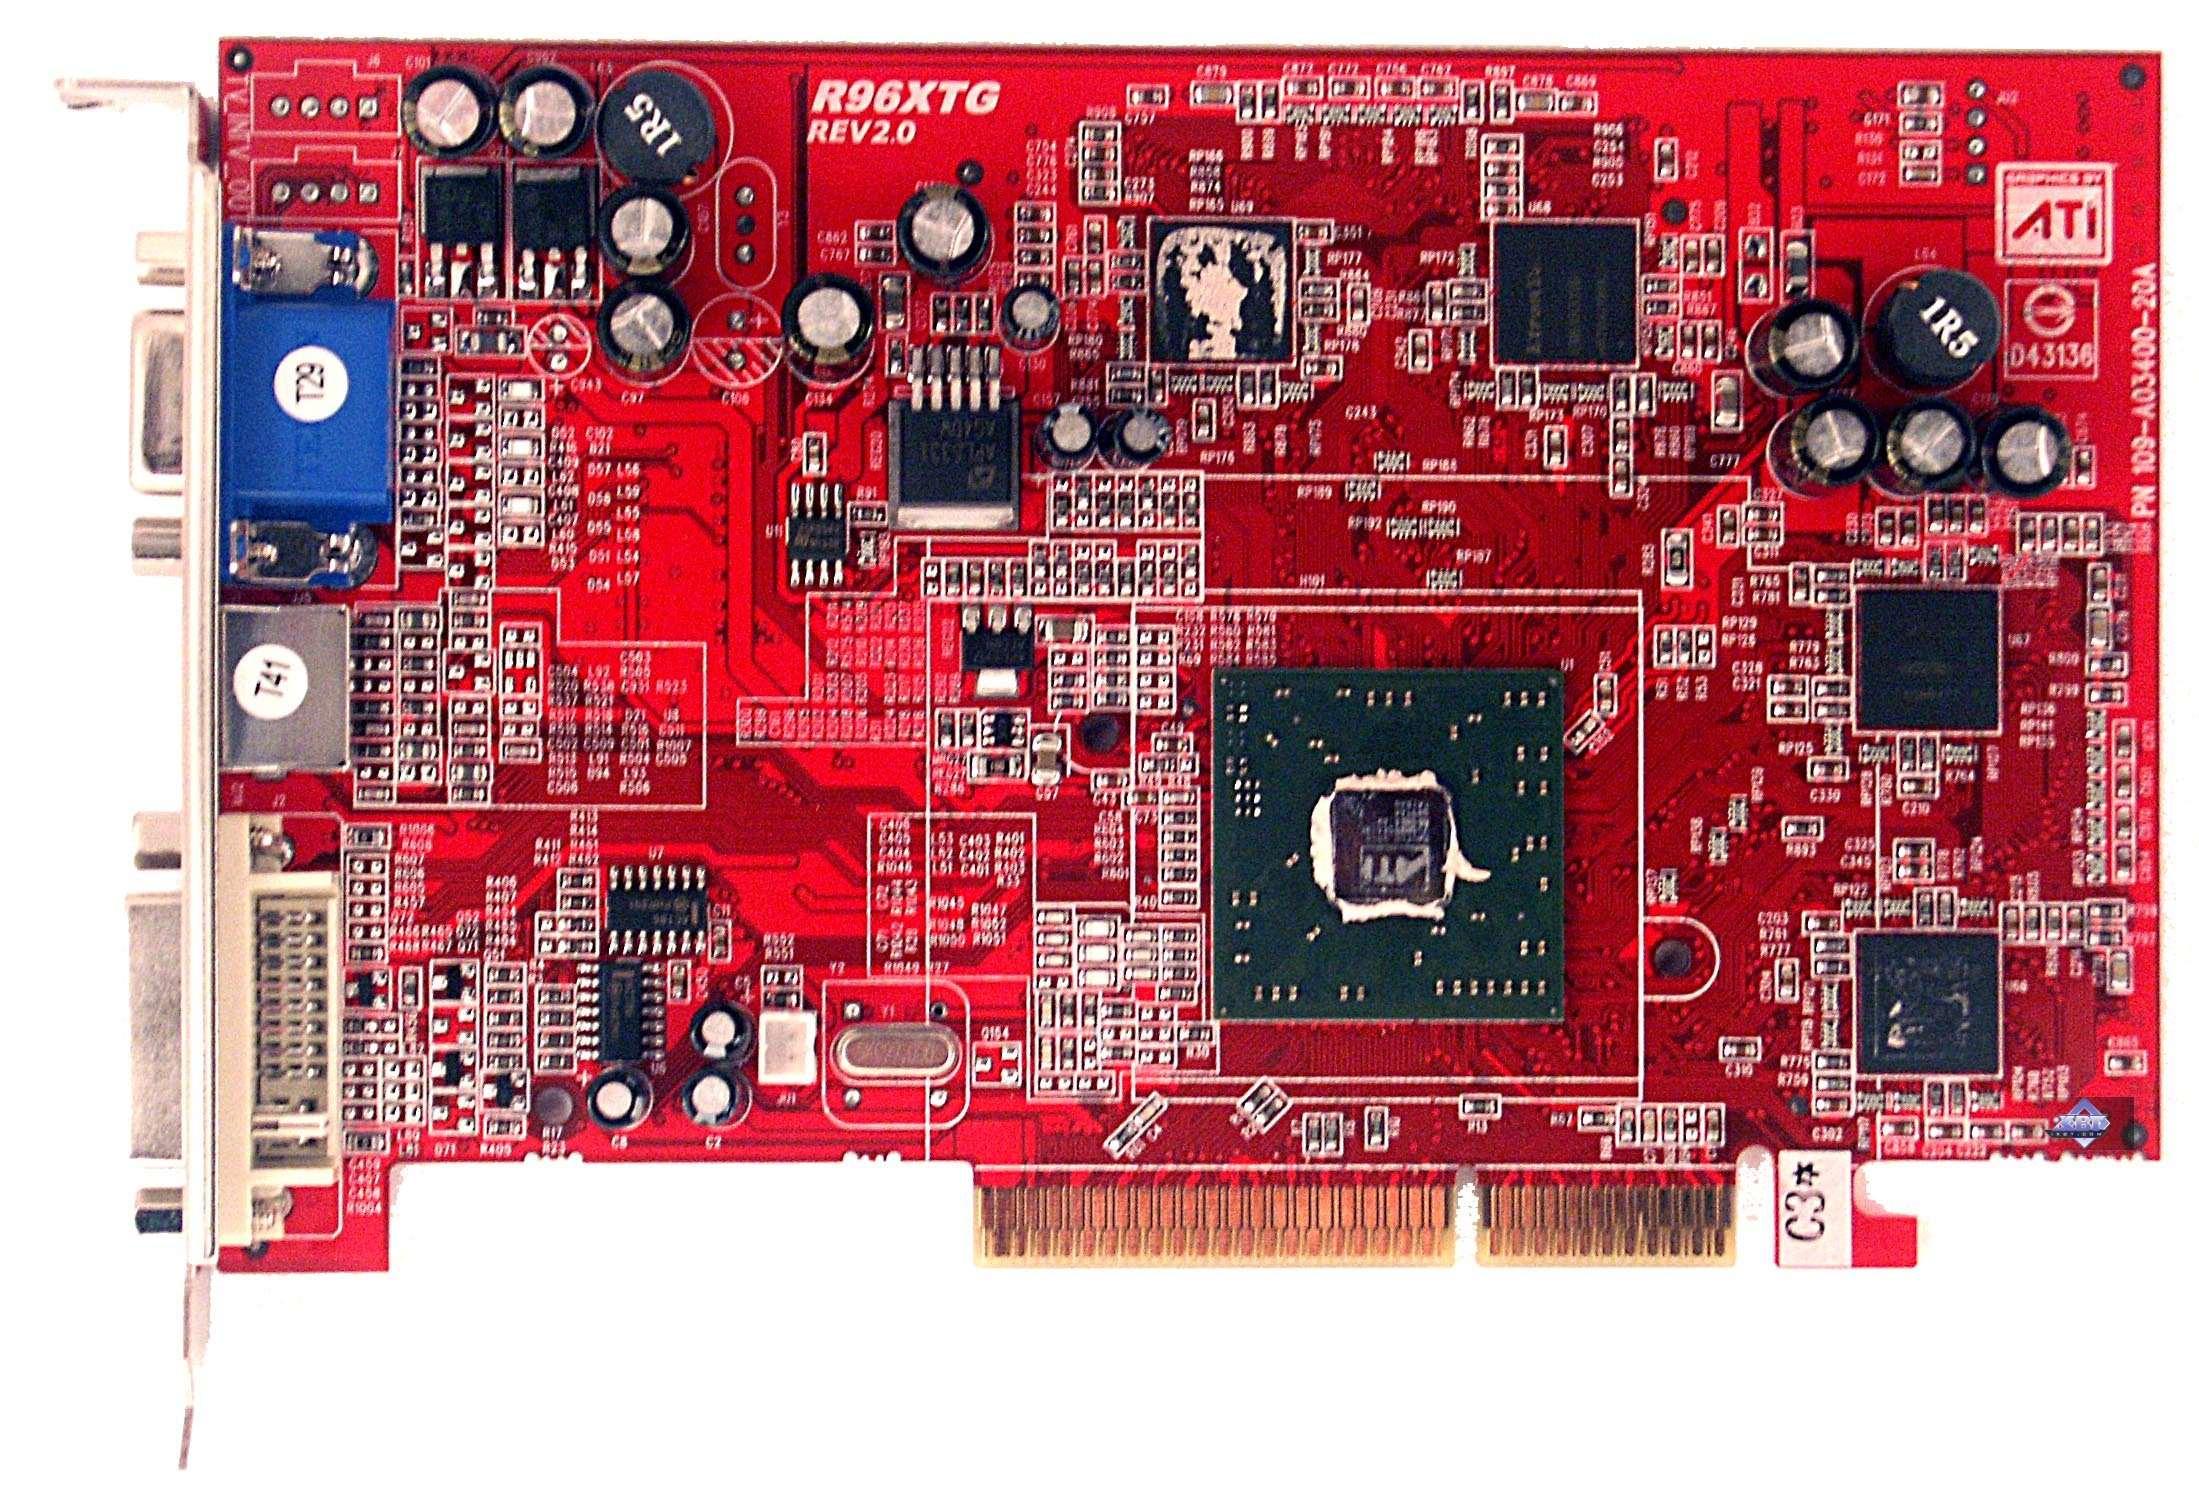 gecube radeon 9600 pro driver download